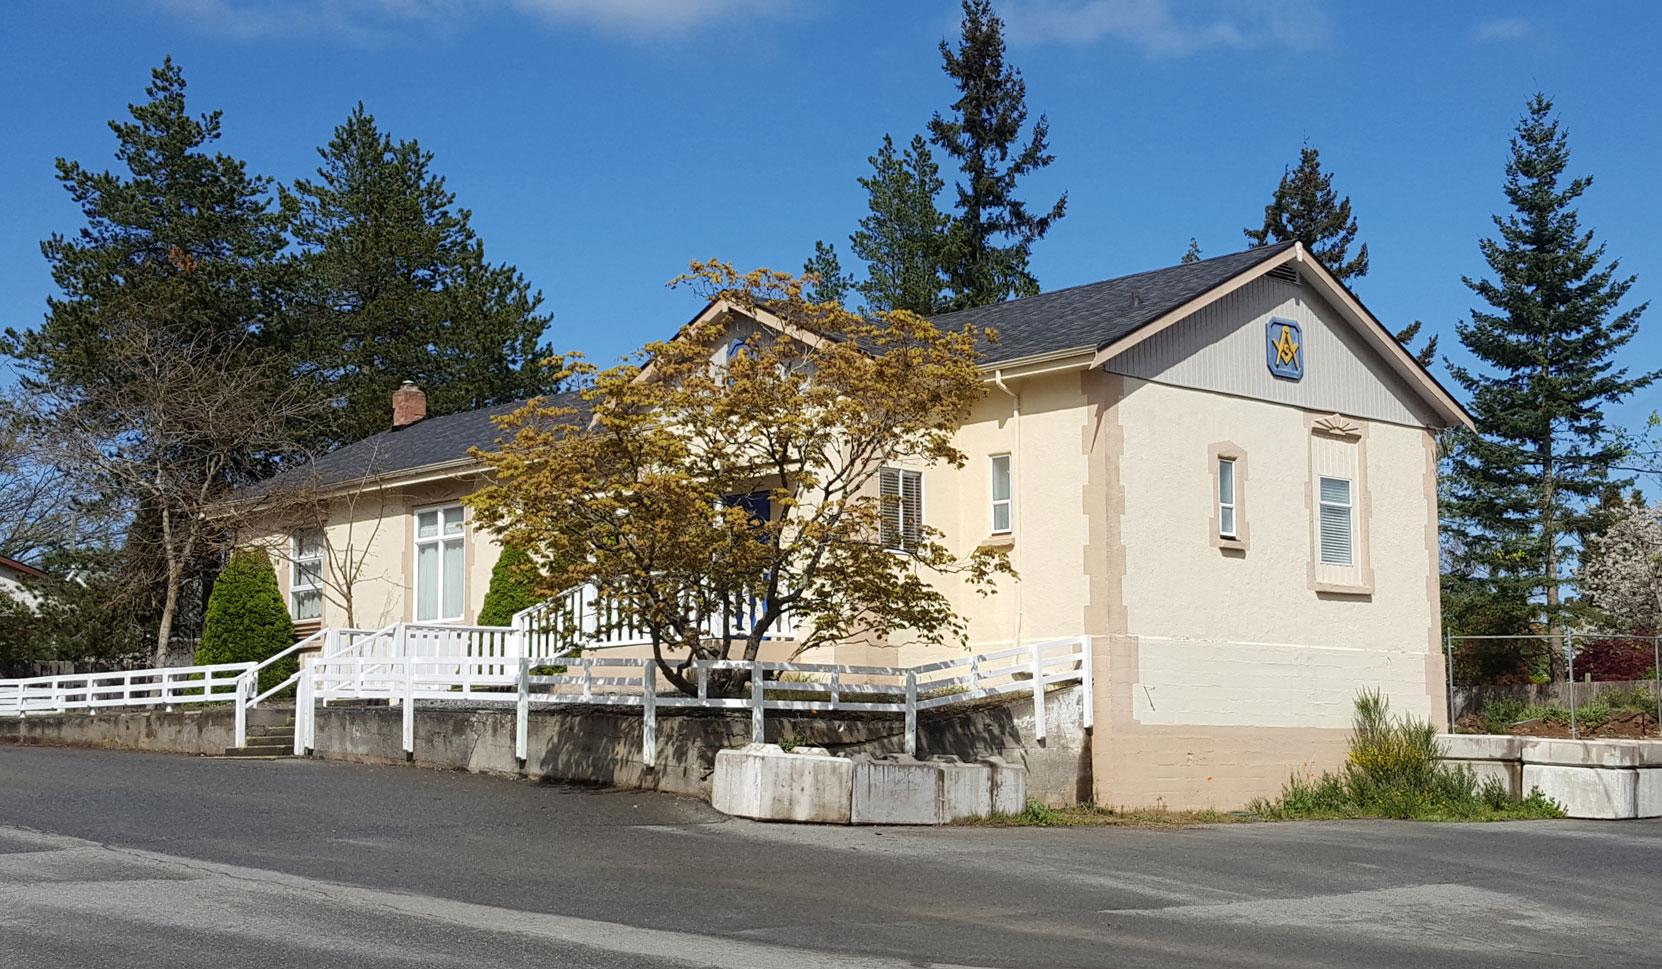 Morpeth Masonic Hall, 620 Morpeth Avenue, Nanaimo, B.C. We rent this venue for Air Brakes Courses in Nanaimo.